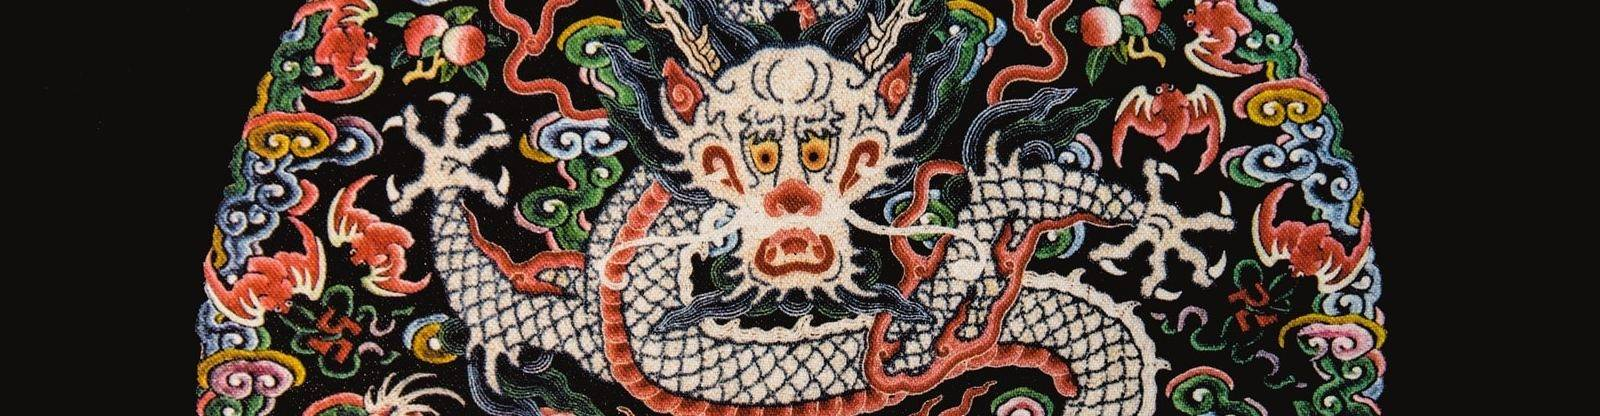 virmuze museum Chinese Mythological Creatures main banner